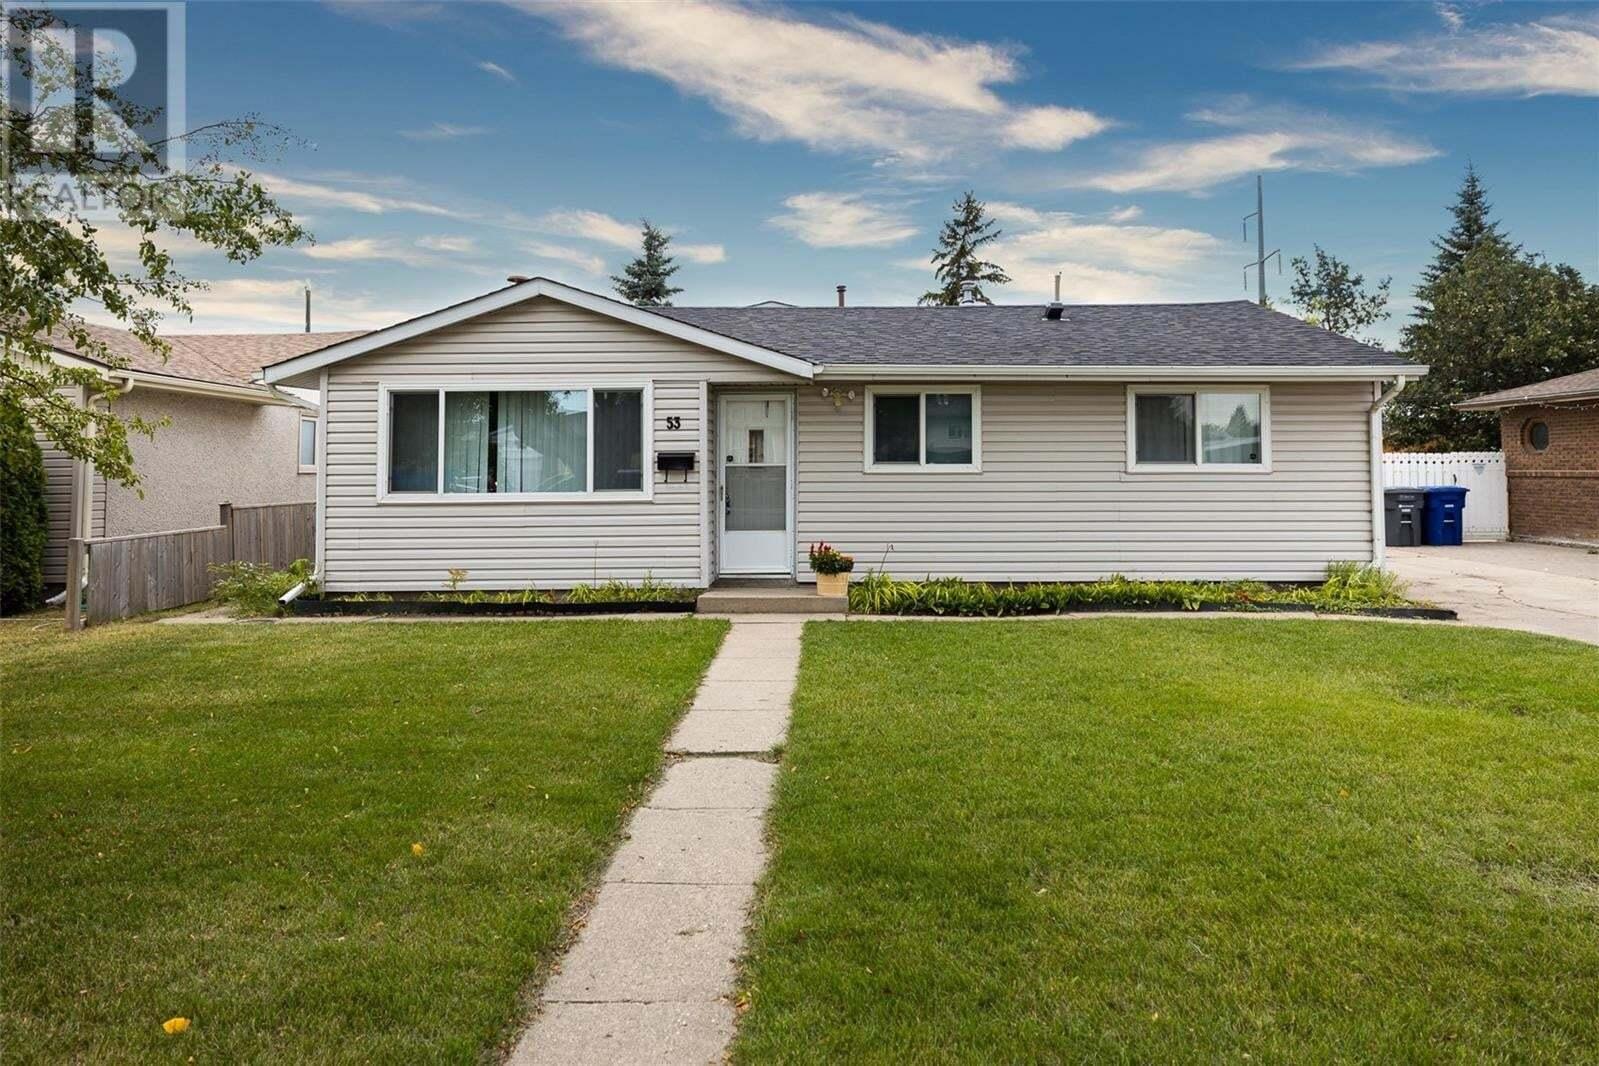 House for sale at 53 Howell Ave Saskatoon Saskatchewan - MLS: SK825839